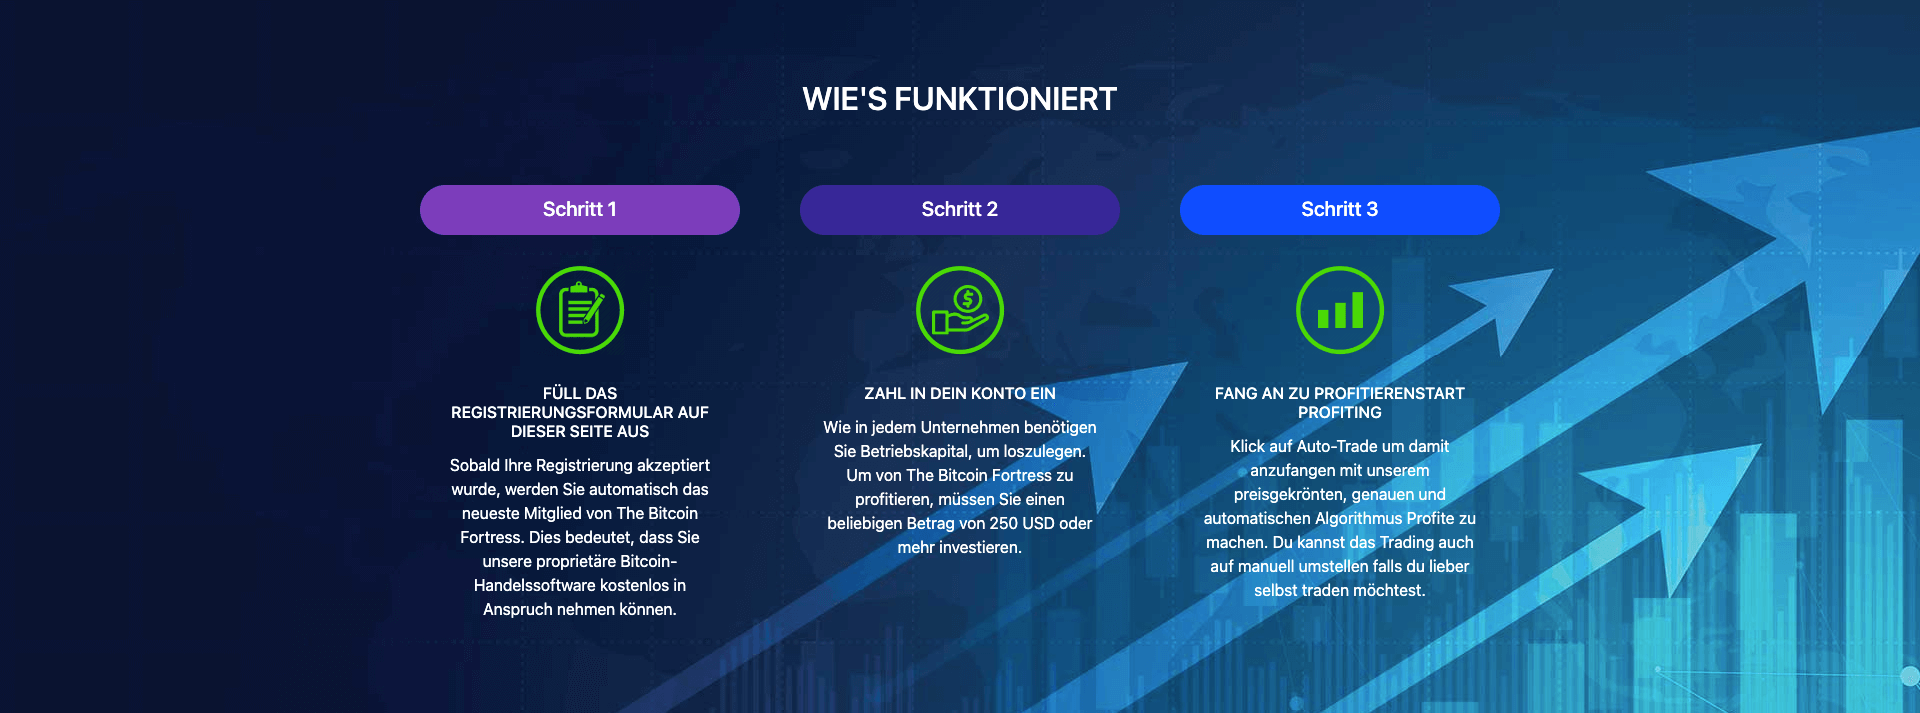 Wie funktioniert Bitcoin Fortress